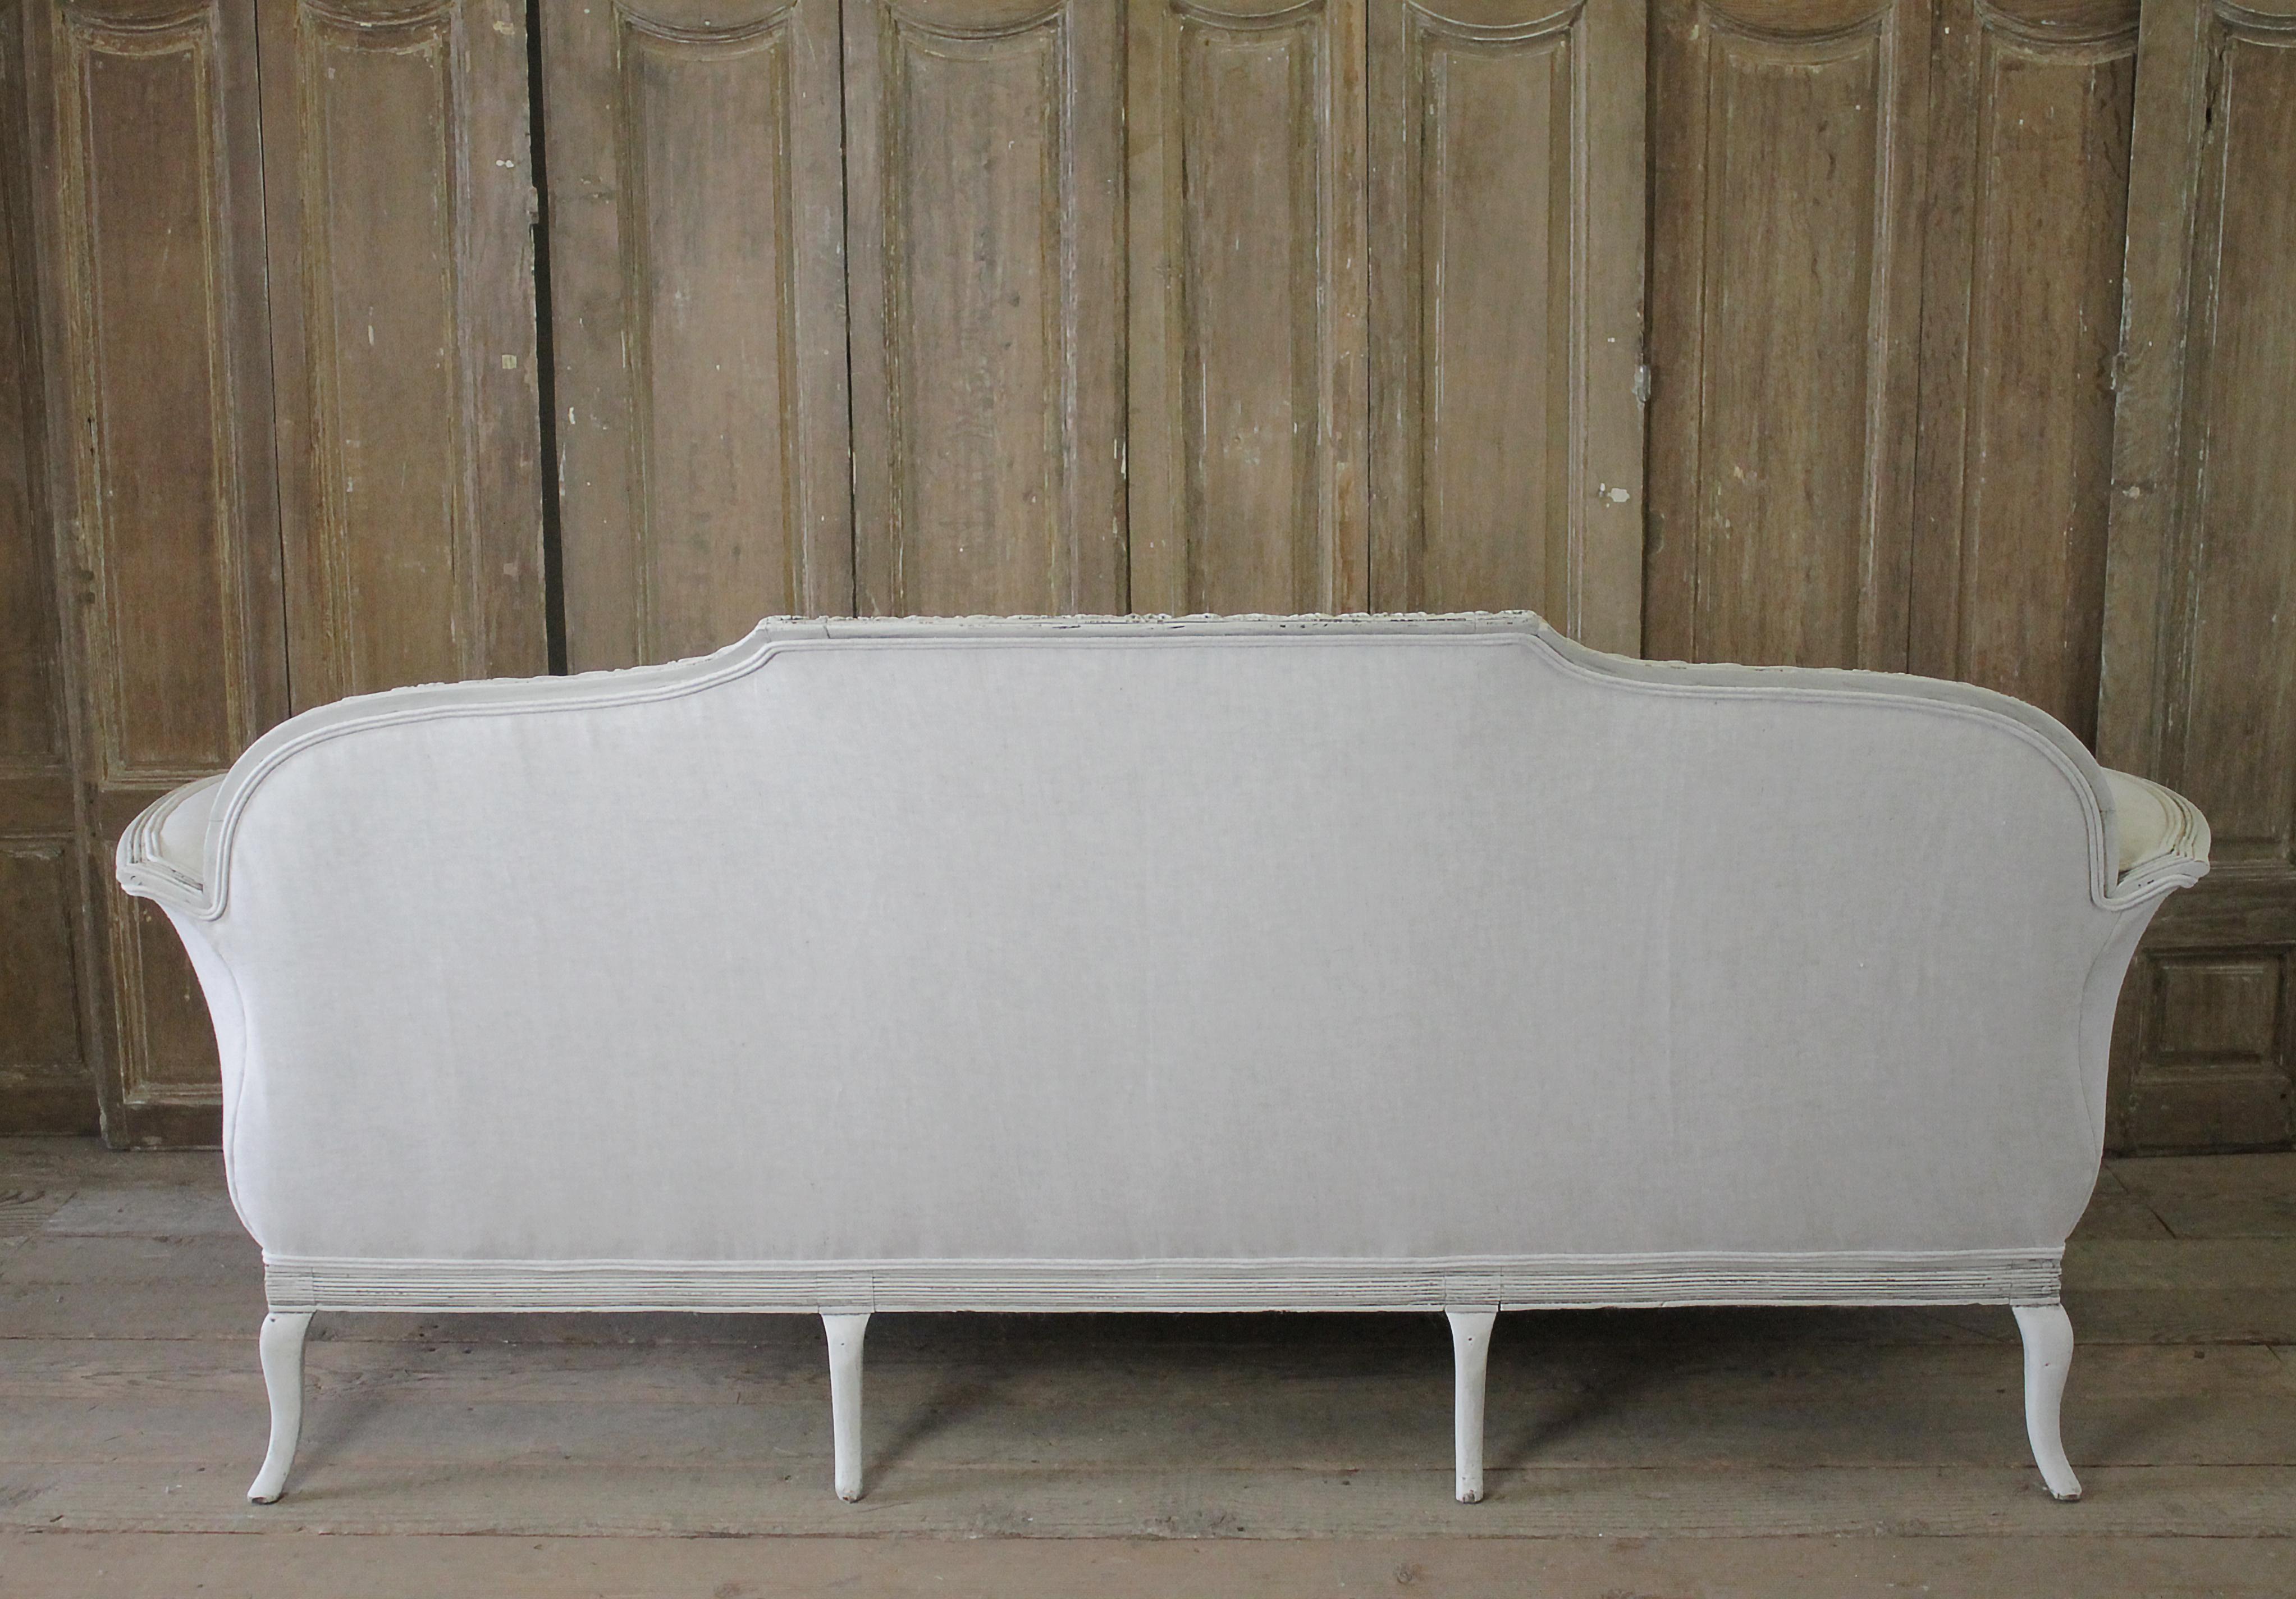 20th Century Italian Neoclassical Sofa Upholstered In Belgian Linen   Image  8 Of 11